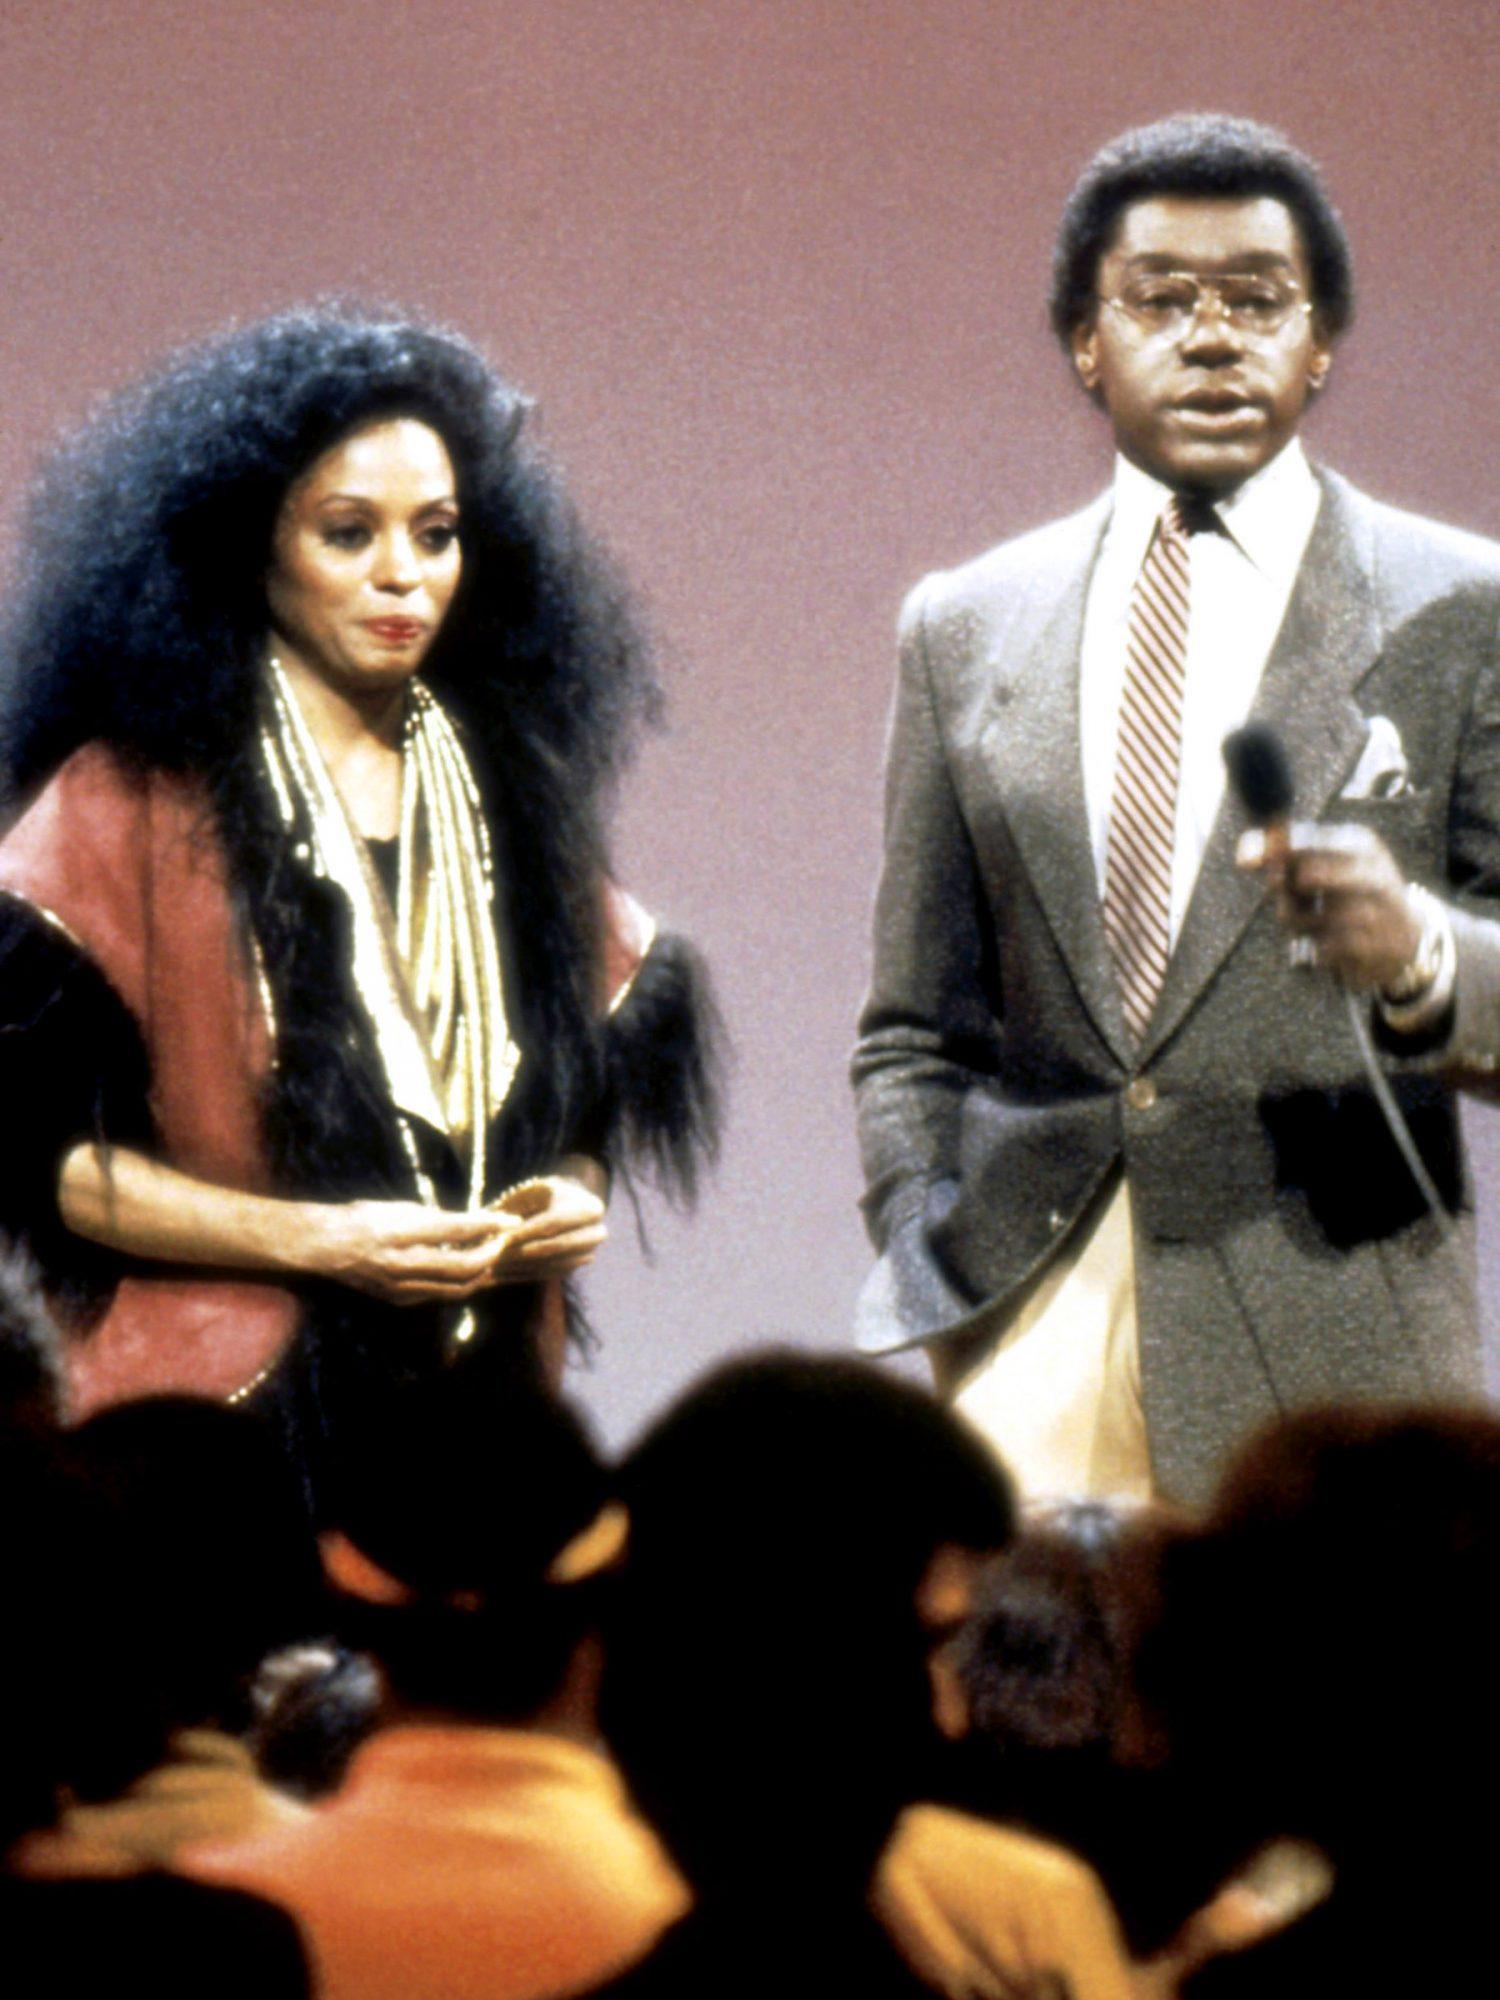 SOUL TRAIN, from left: Diana Ross, Don Cornelius, 1971-present